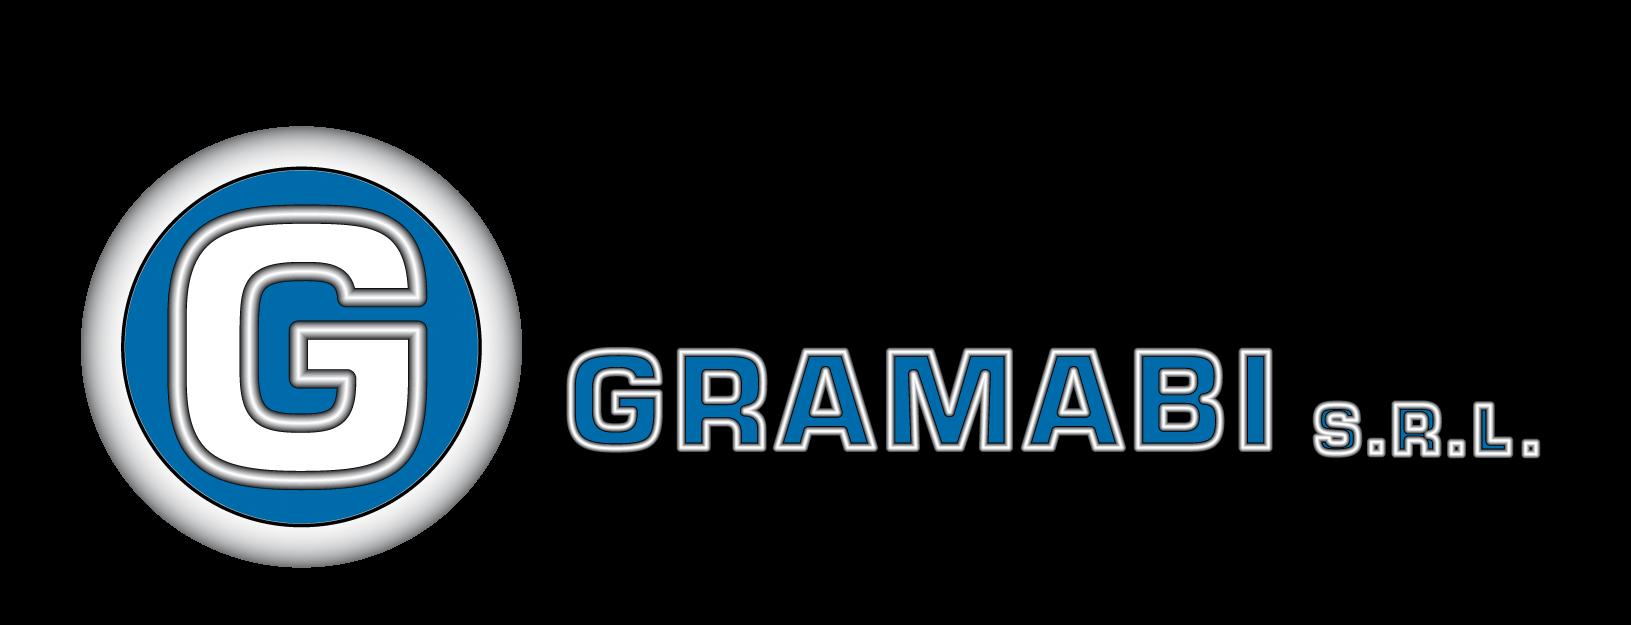 GRAMABI